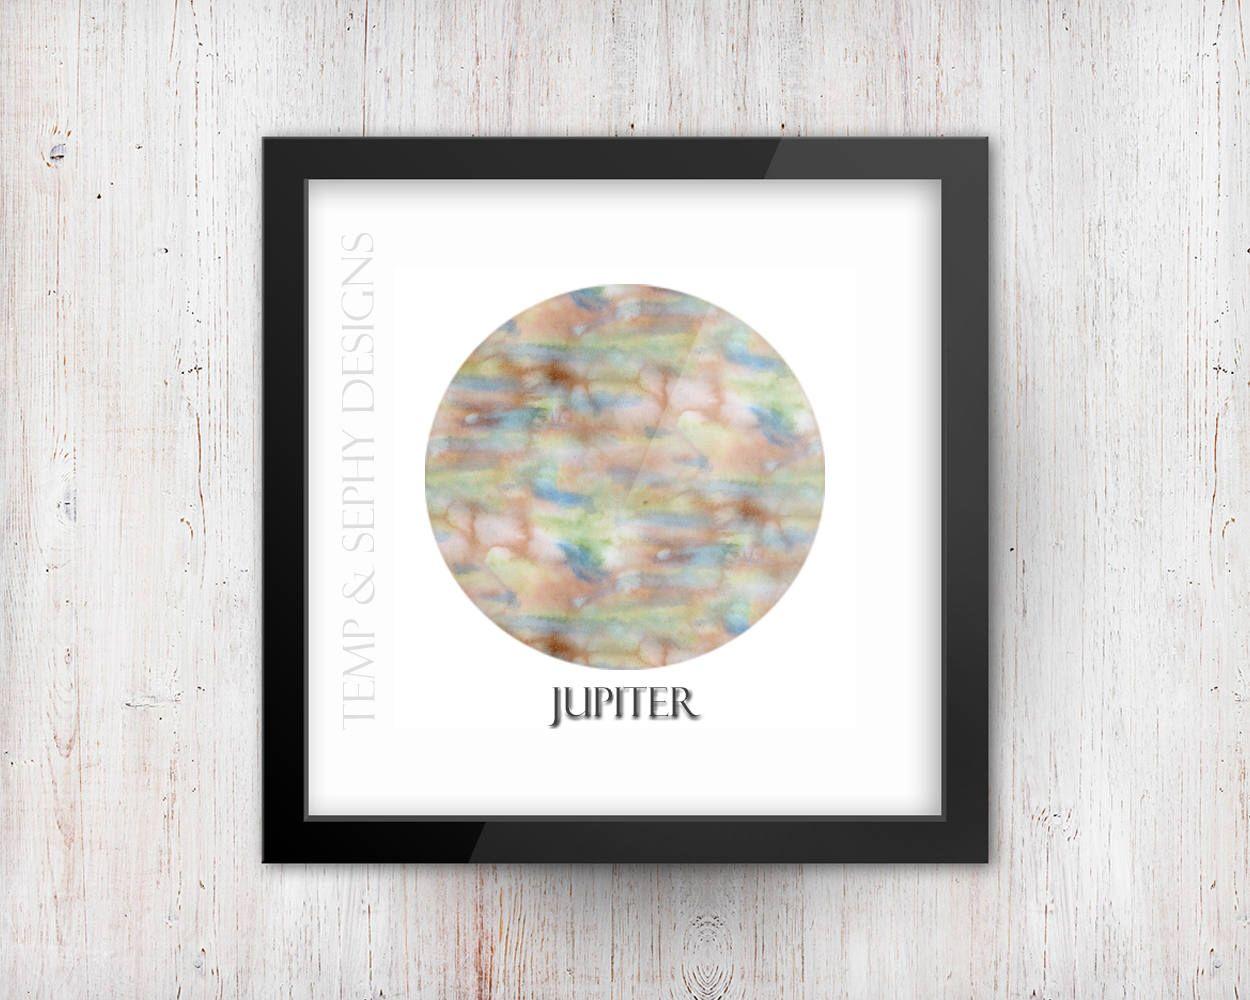 1250x1000 Printable Jupiter Wall Art Watercolor Inspired 8x8